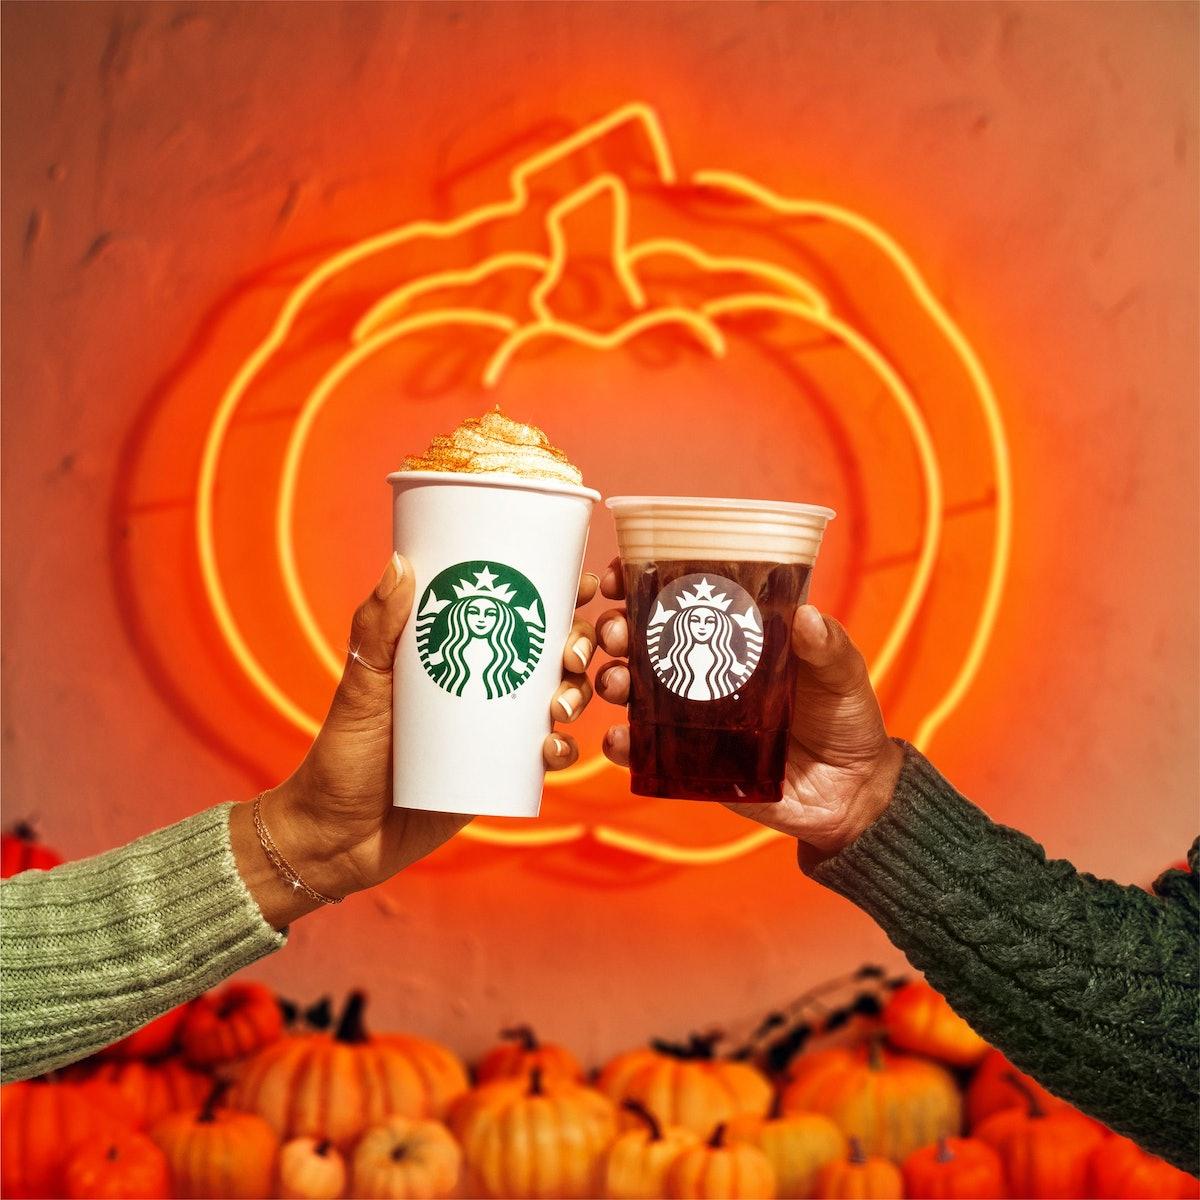 Starbucks' Pumpkin Spice Latte is coming back on Aug. 24, 2021.